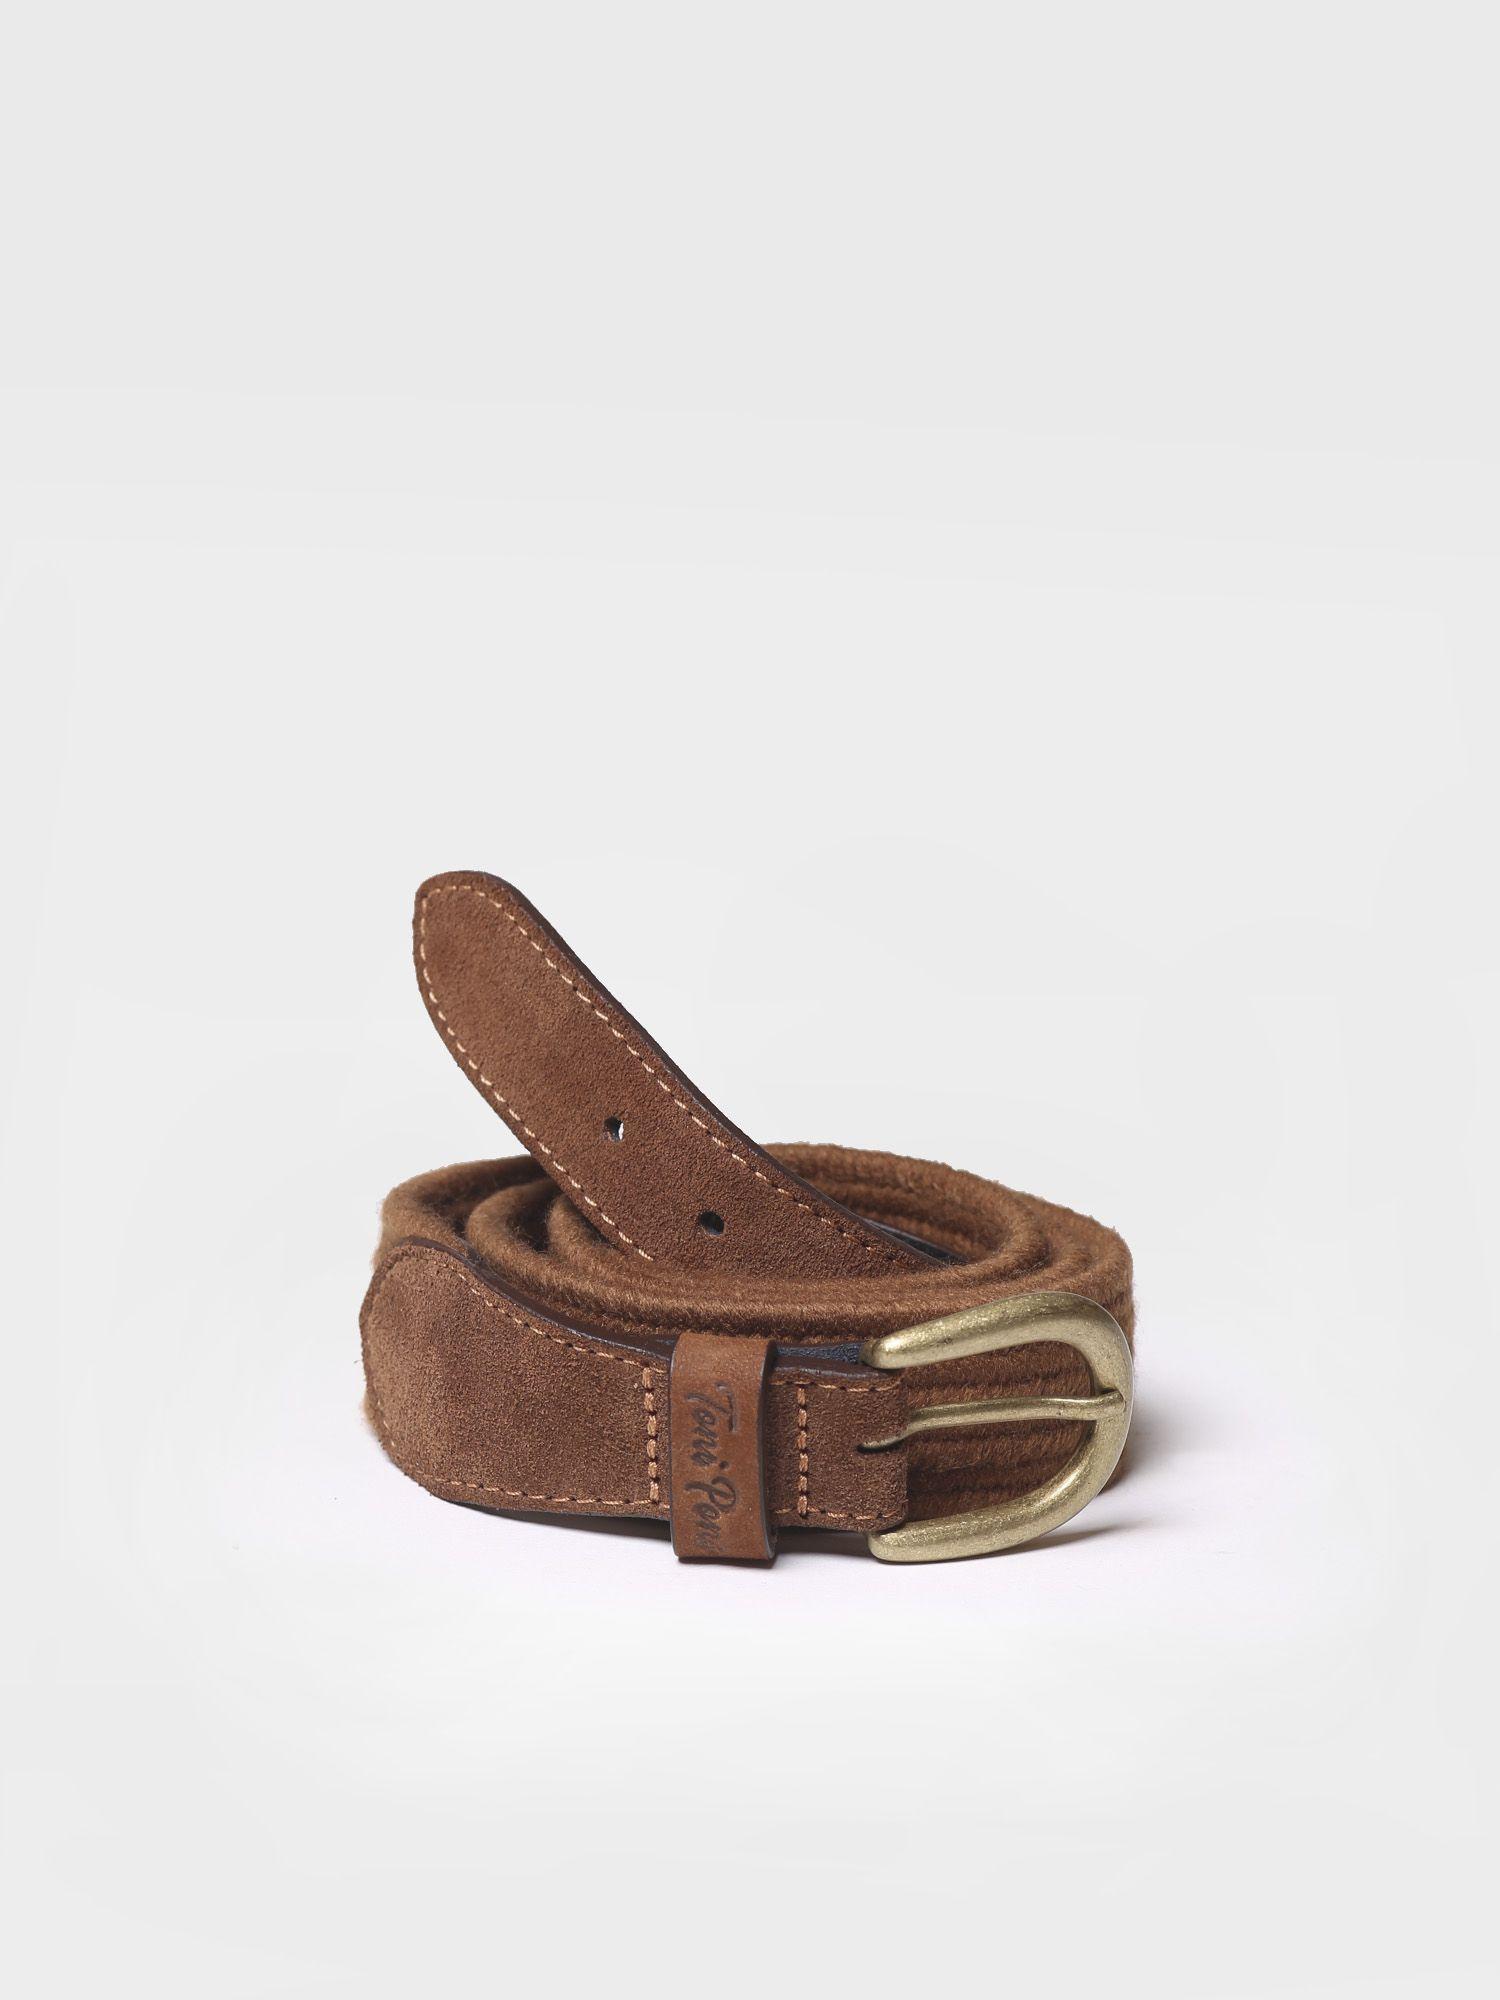 Belt in elastic fabric in tan shades - NALA